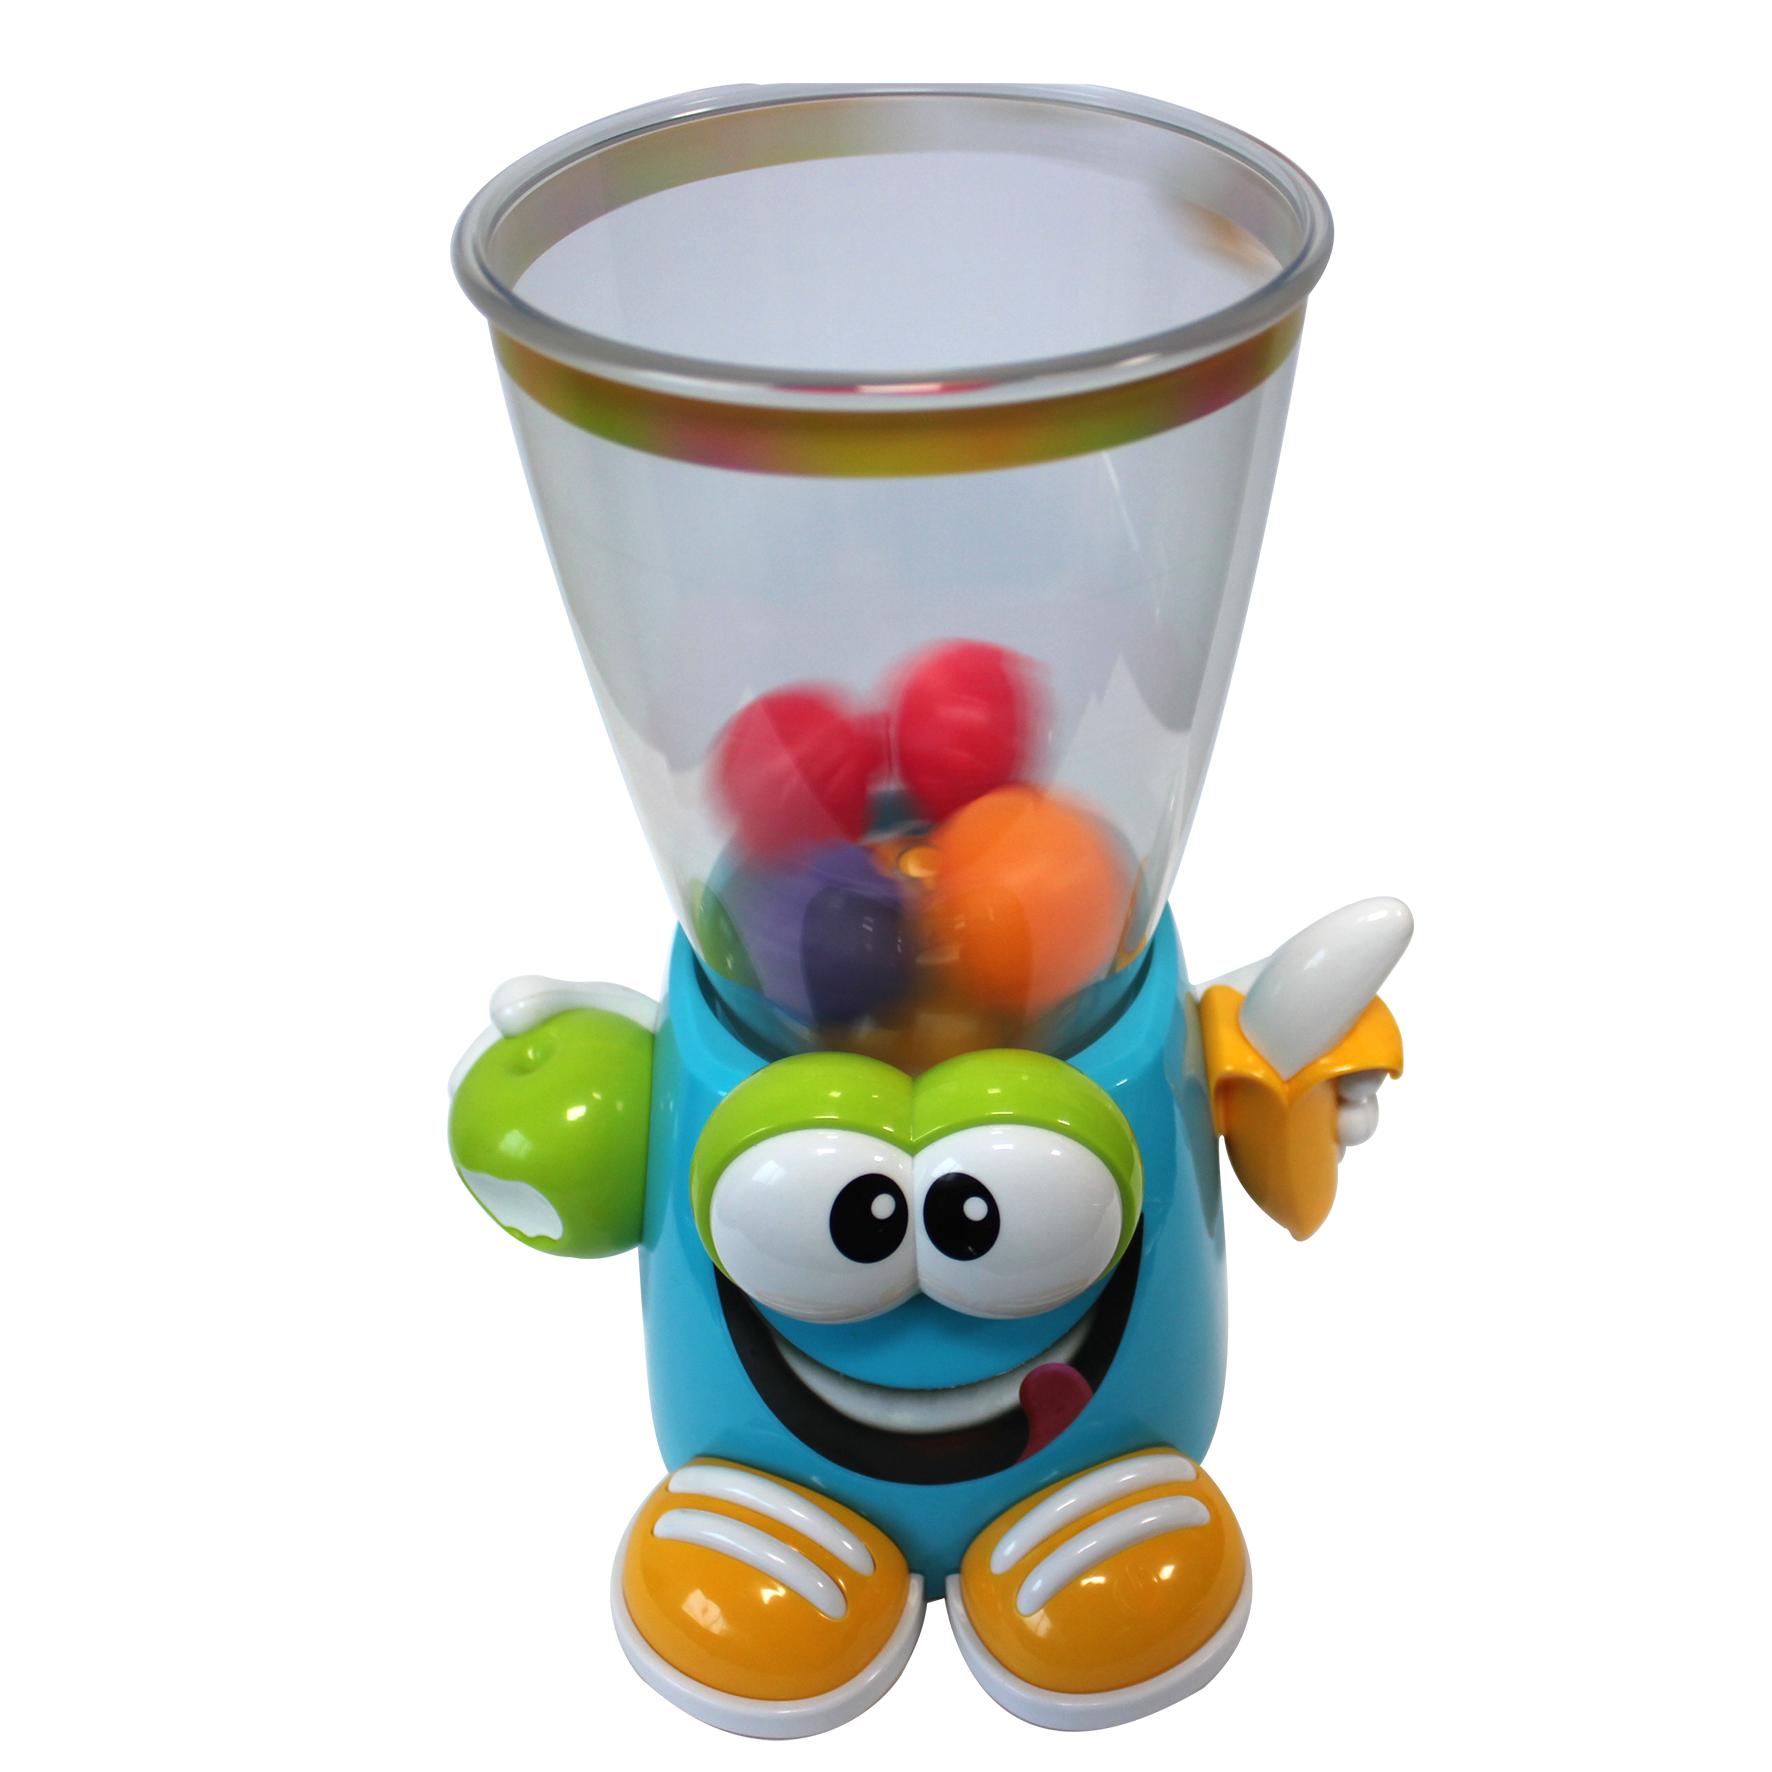 Children Fruits Juicy Toys